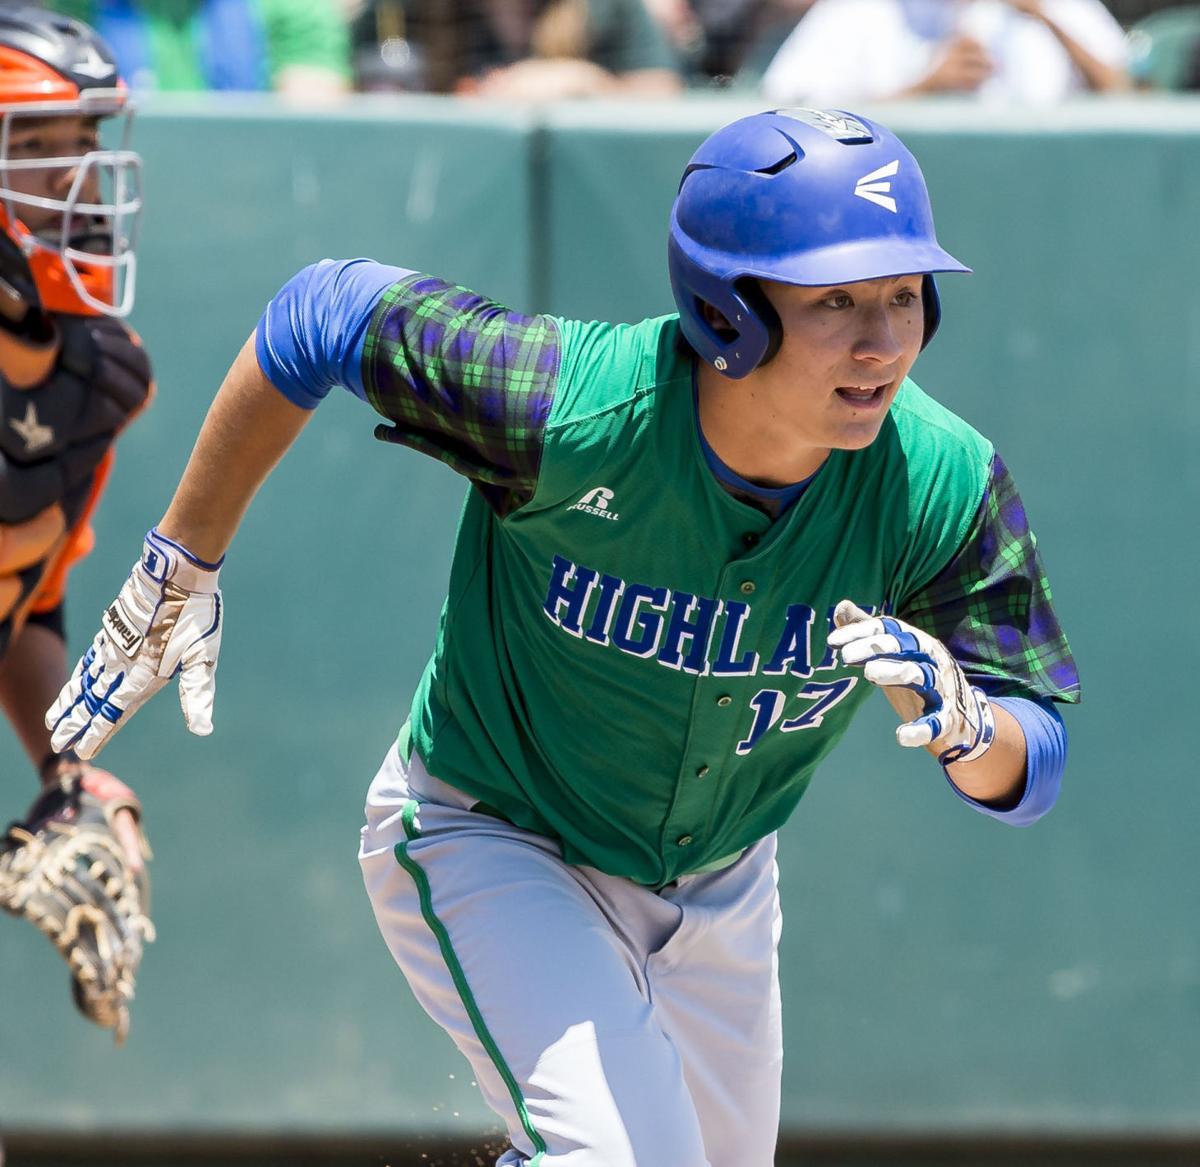 Highland wins first baseball section championship | Sports ...